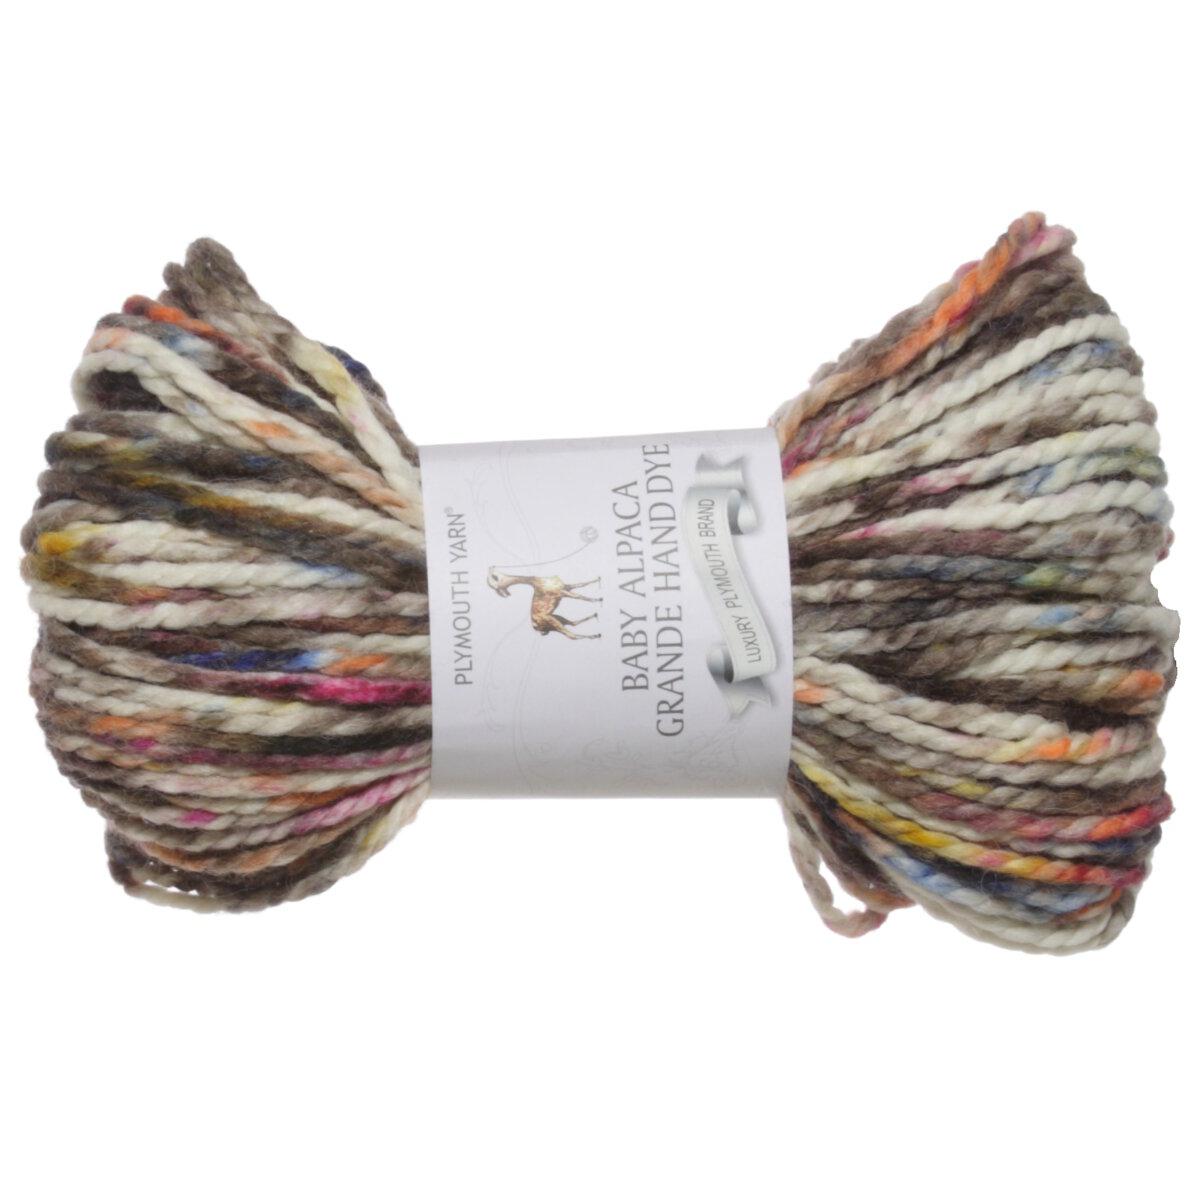 Plymouth Yarn Baby Alpaca Grande Hand Dye Yarn 144 At